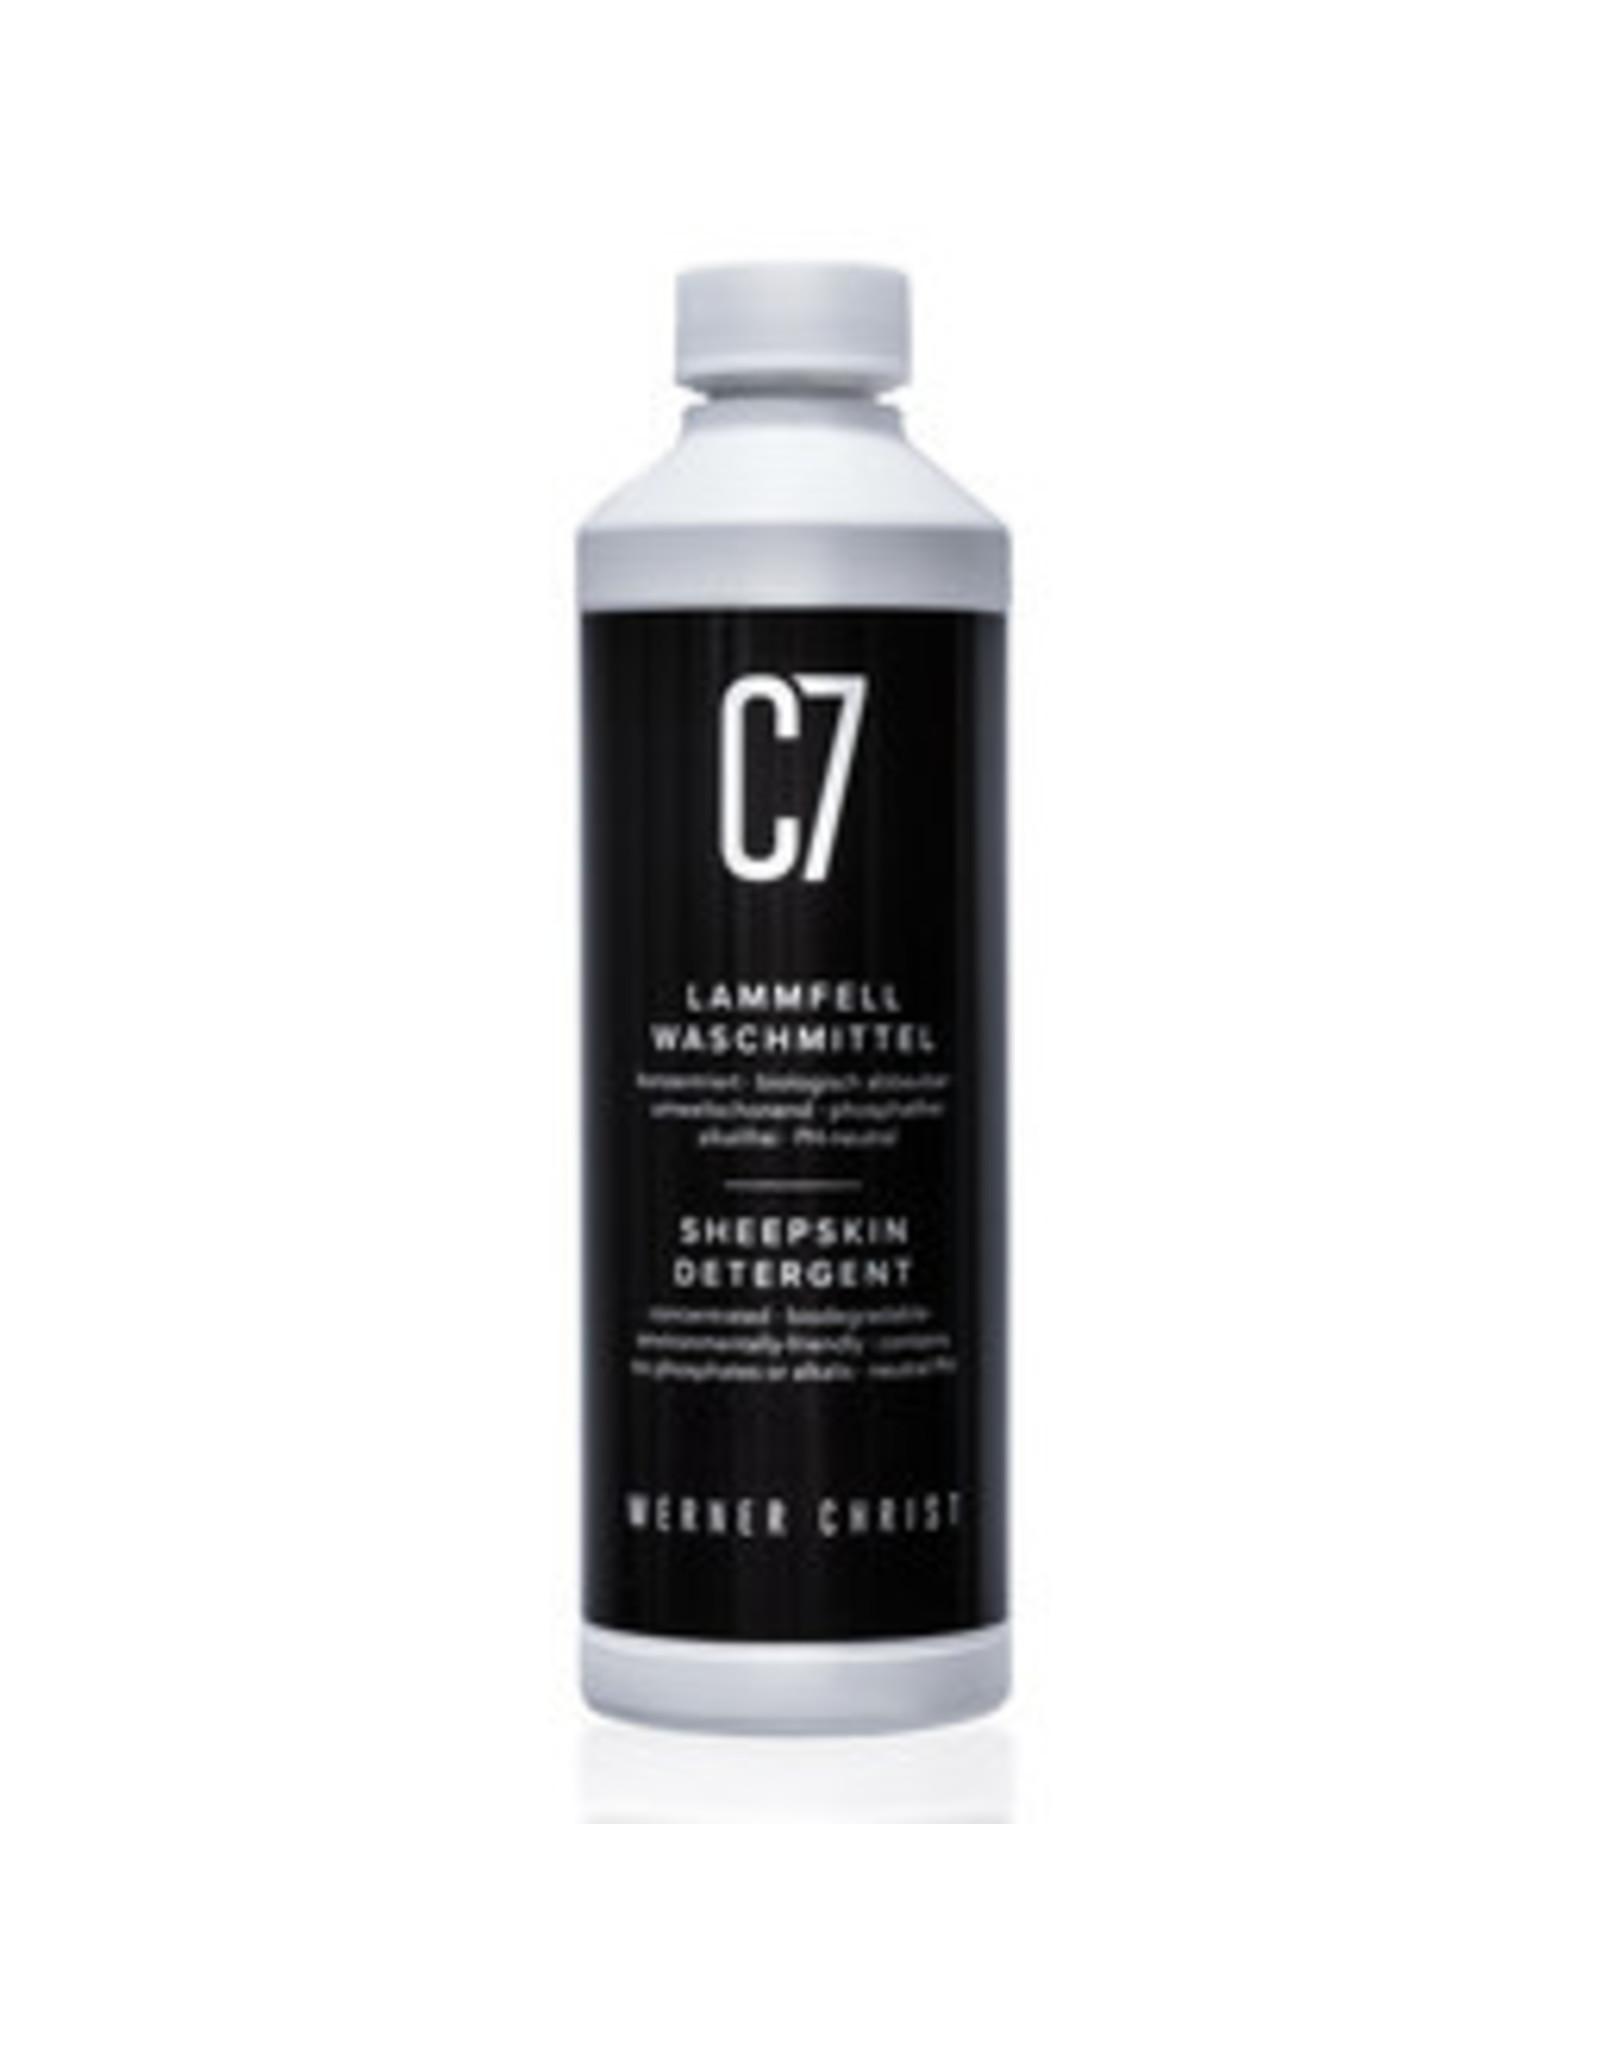 Christ Lammfellwaschmittel Konzentrat C7